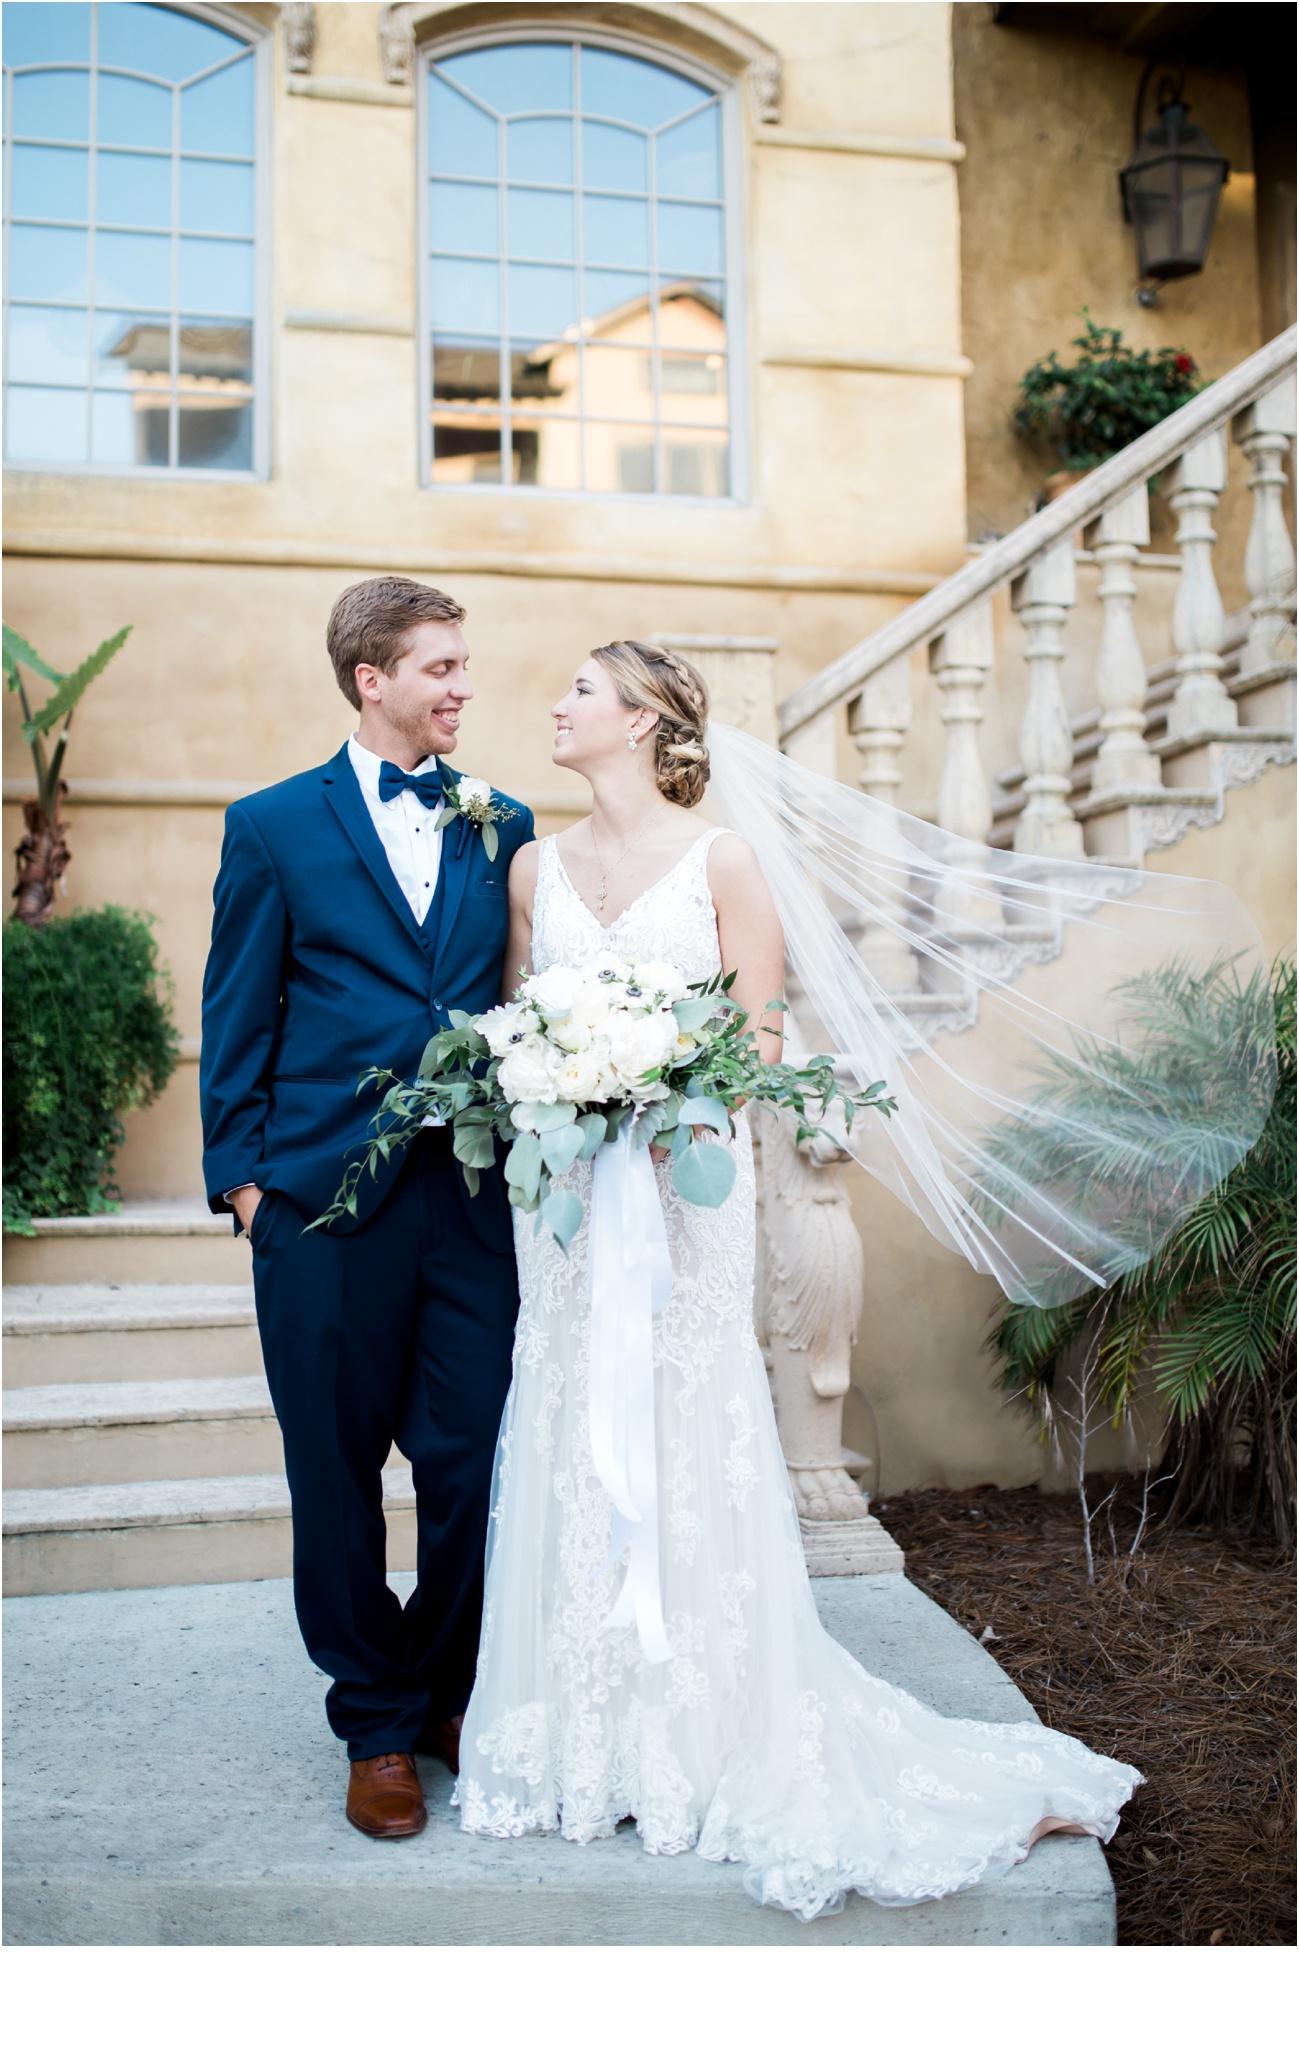 Rainey_Gregg_Photography_St._Simons_Island_Georgia_California_Wedding_Portrait_Photography_0658.jpg